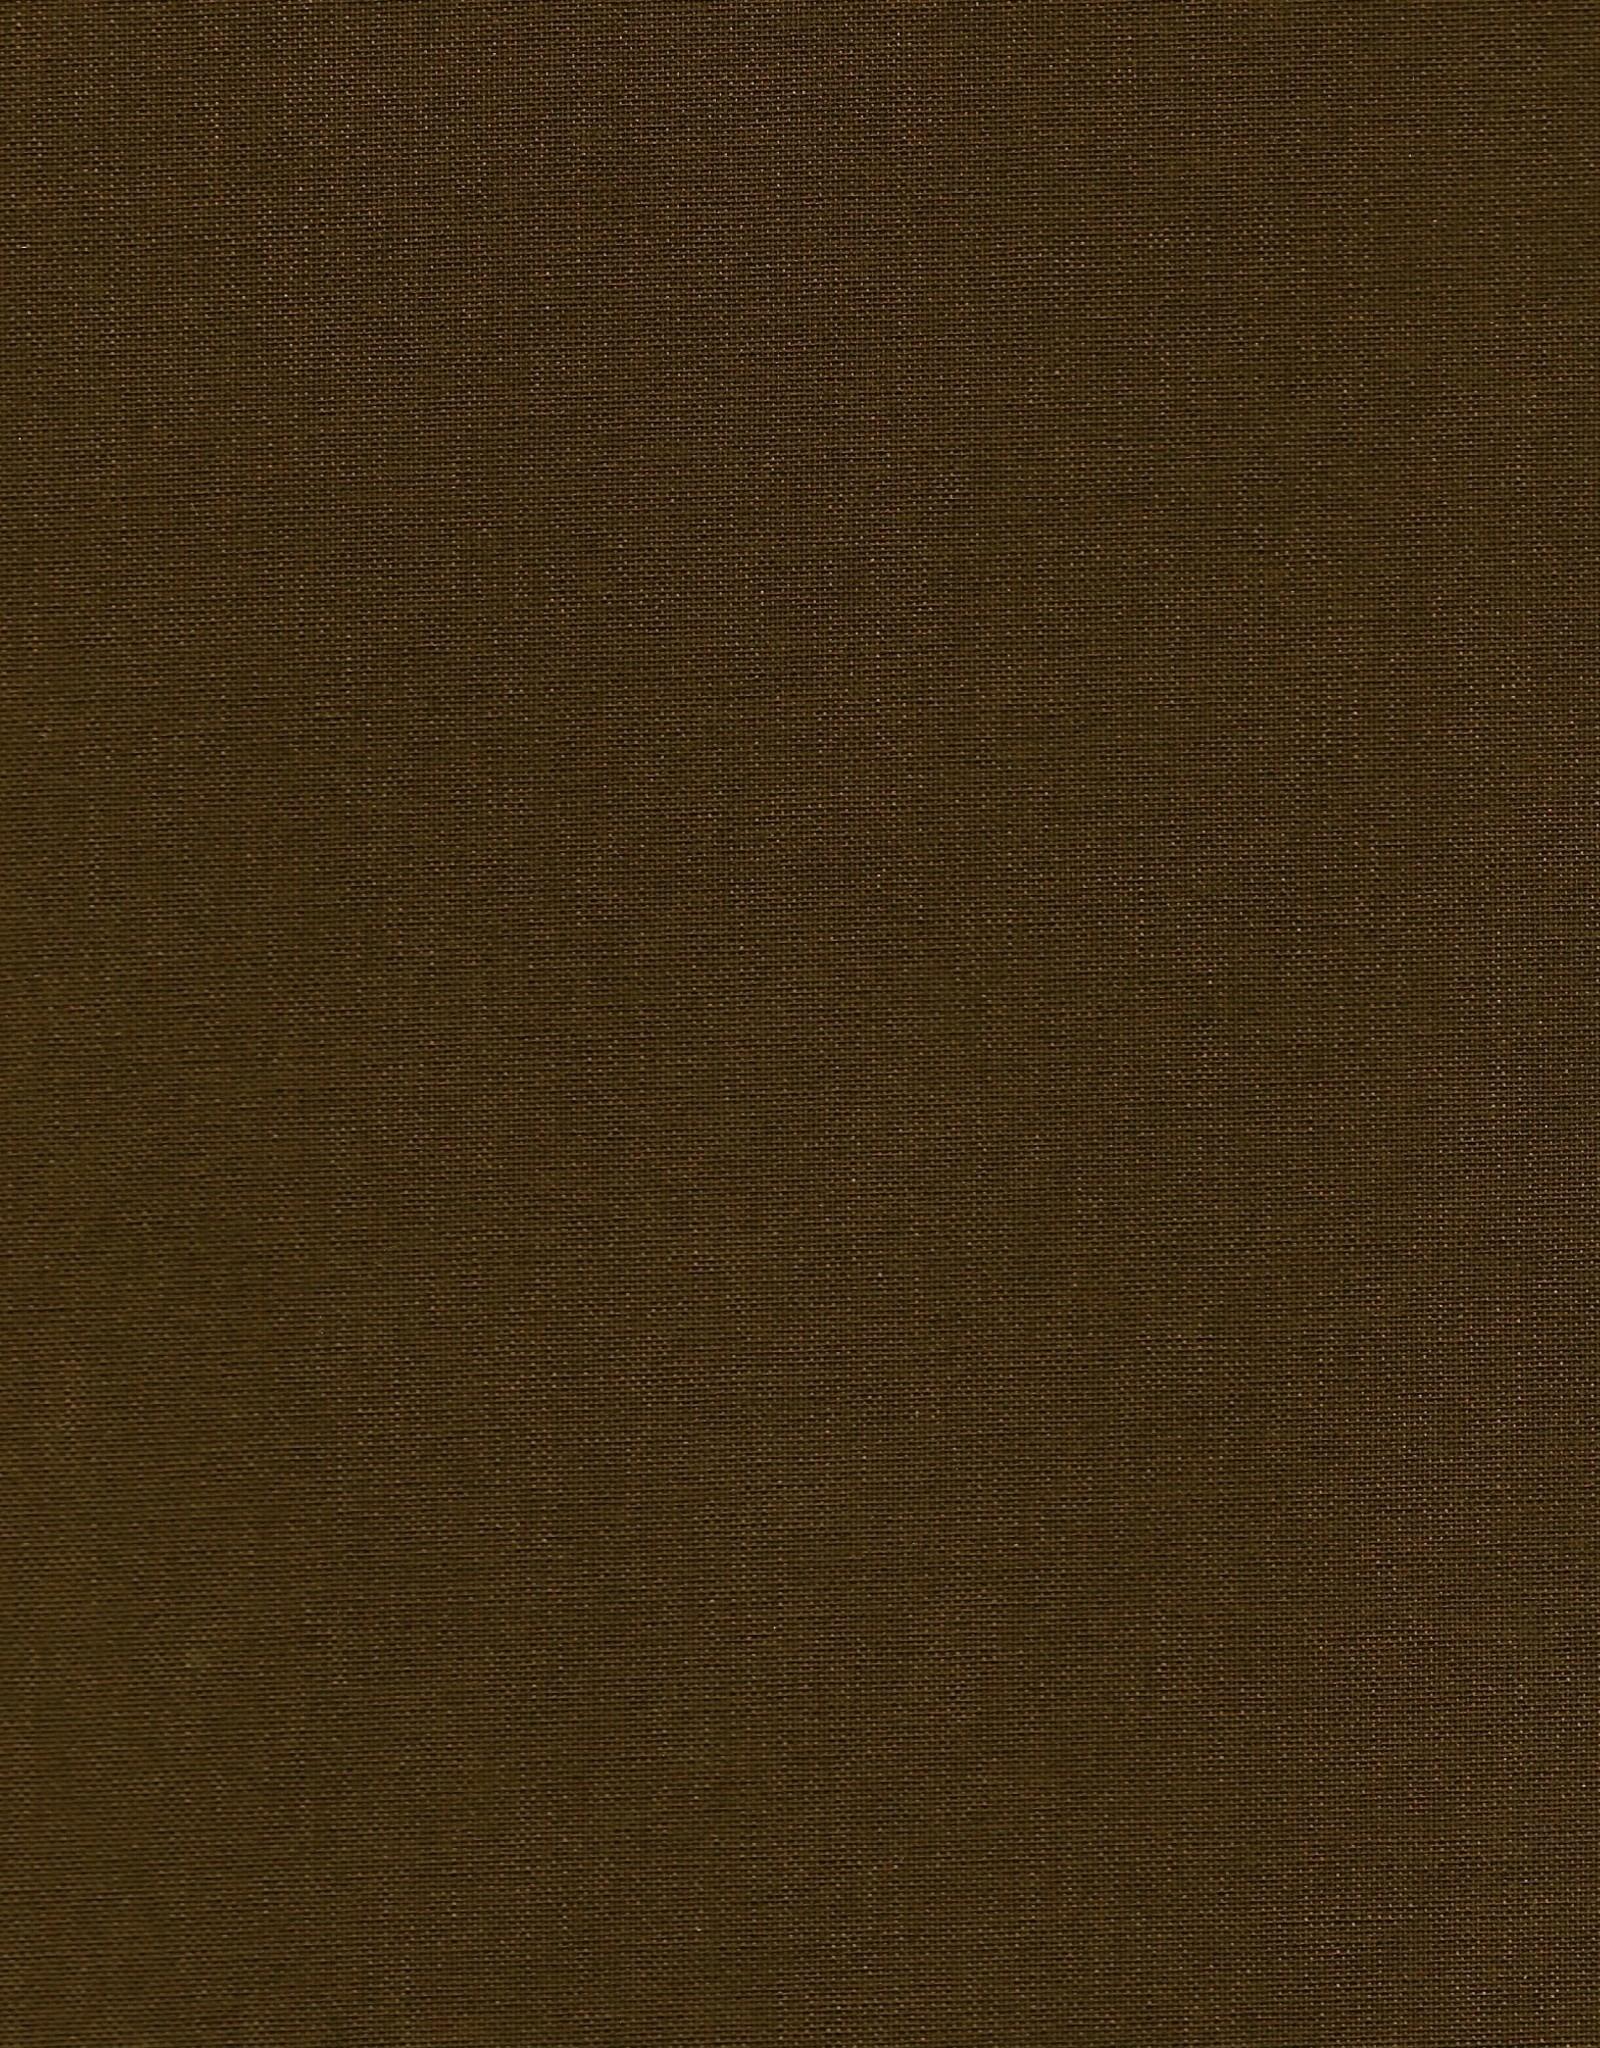 "Book Cloth Chocolate, 17"" x 19"", 1 Sheet, Acid-Free, 100% Rayon, Paper Backed"